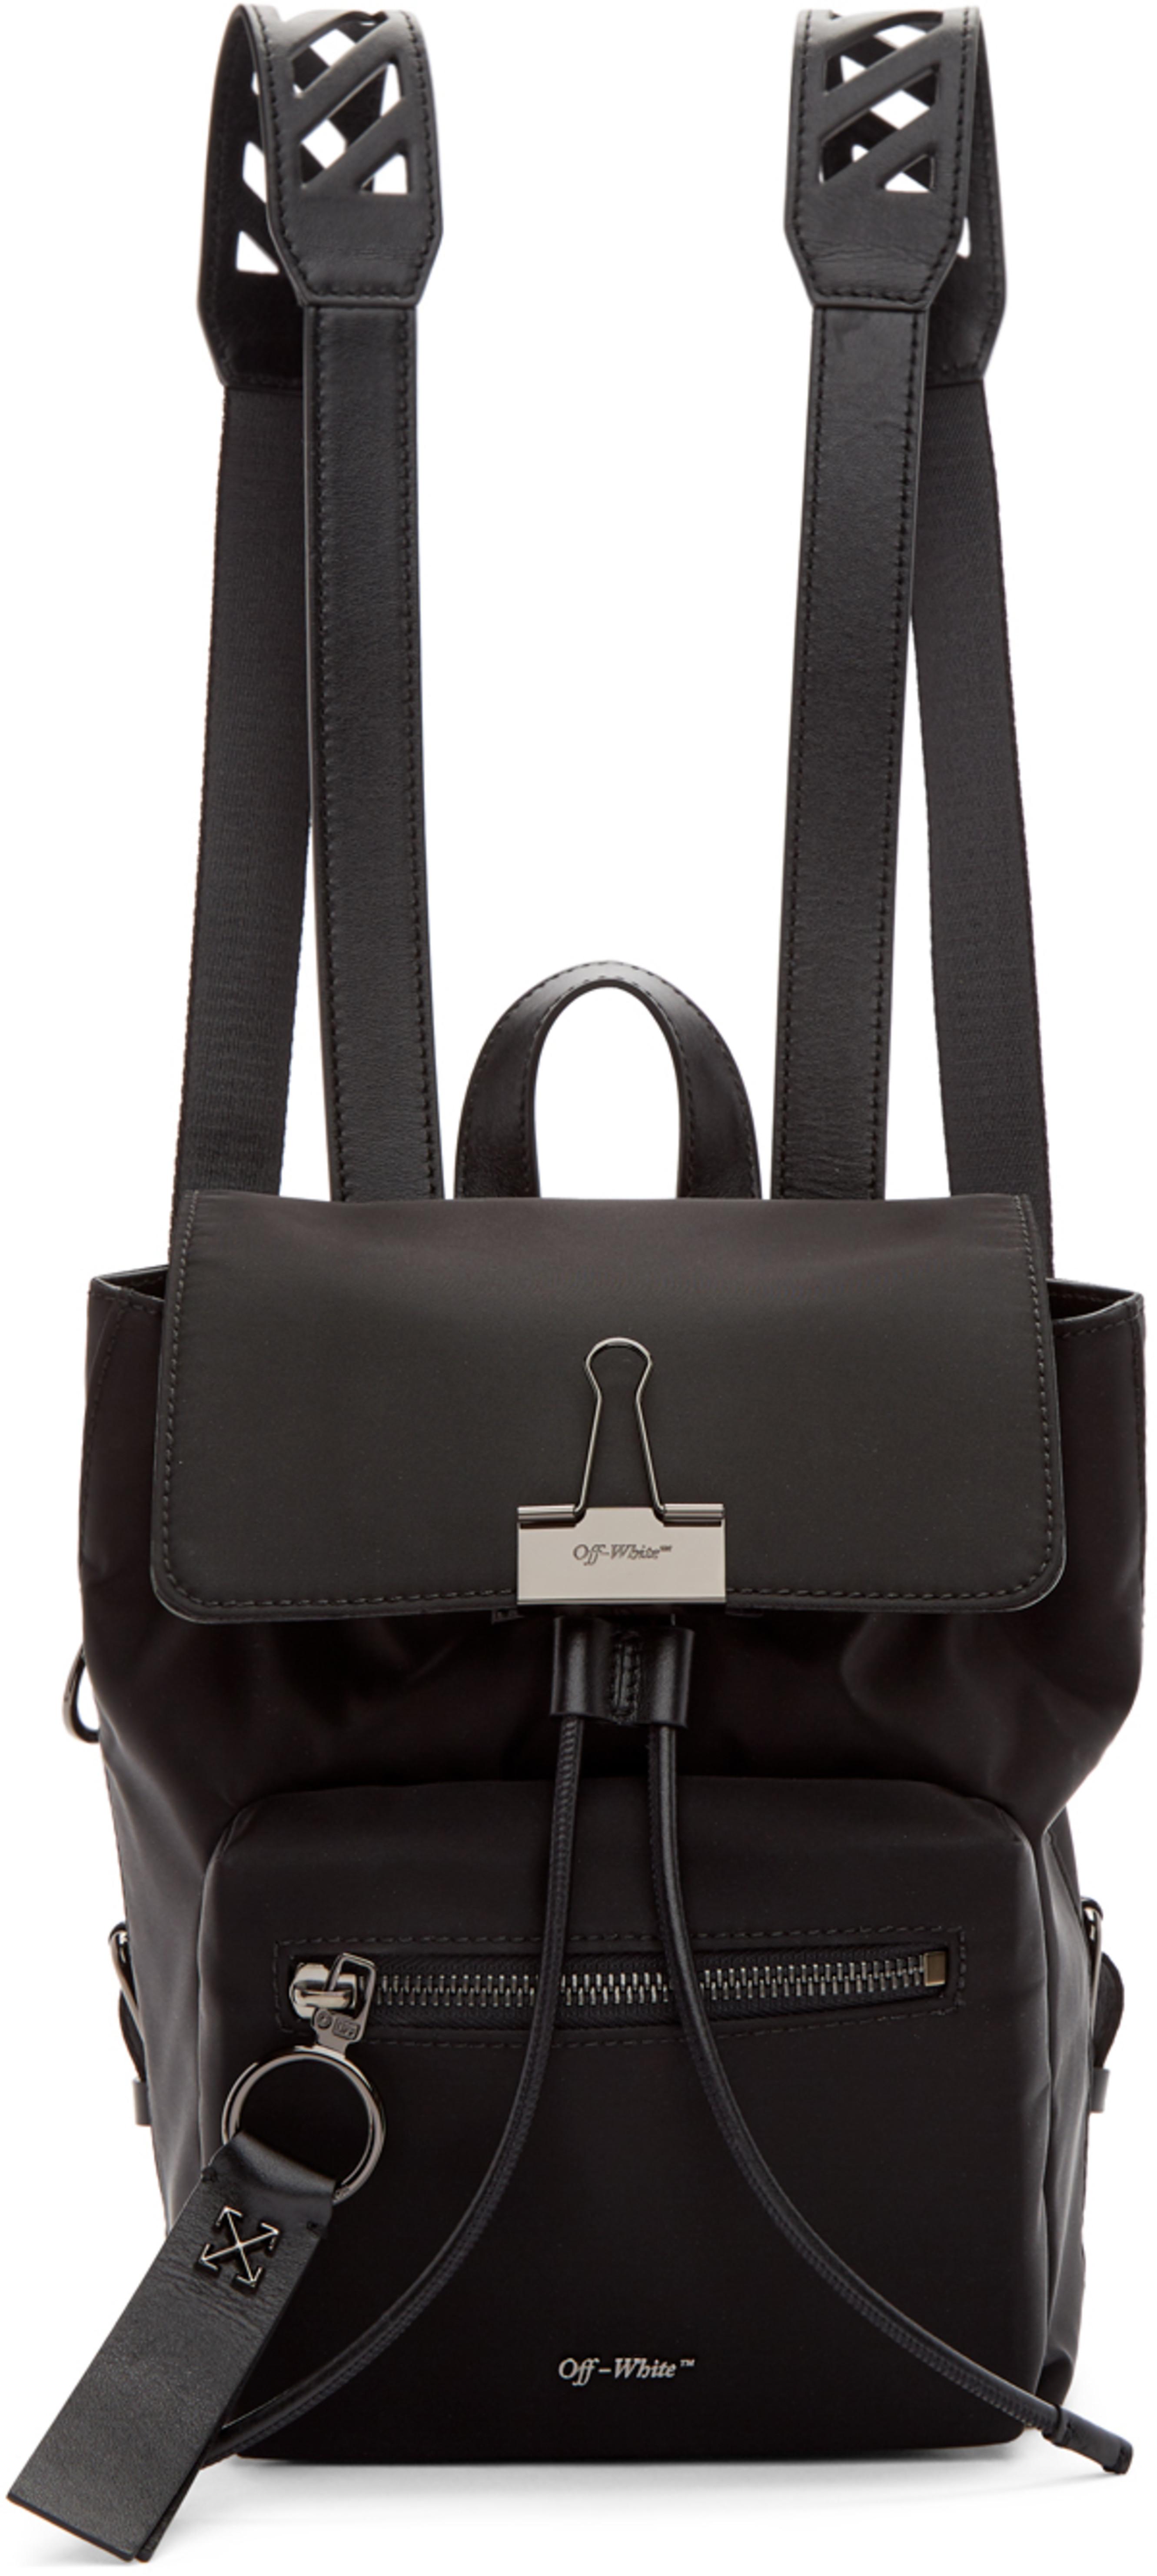 9776dc1f7e Off-white bags for Women